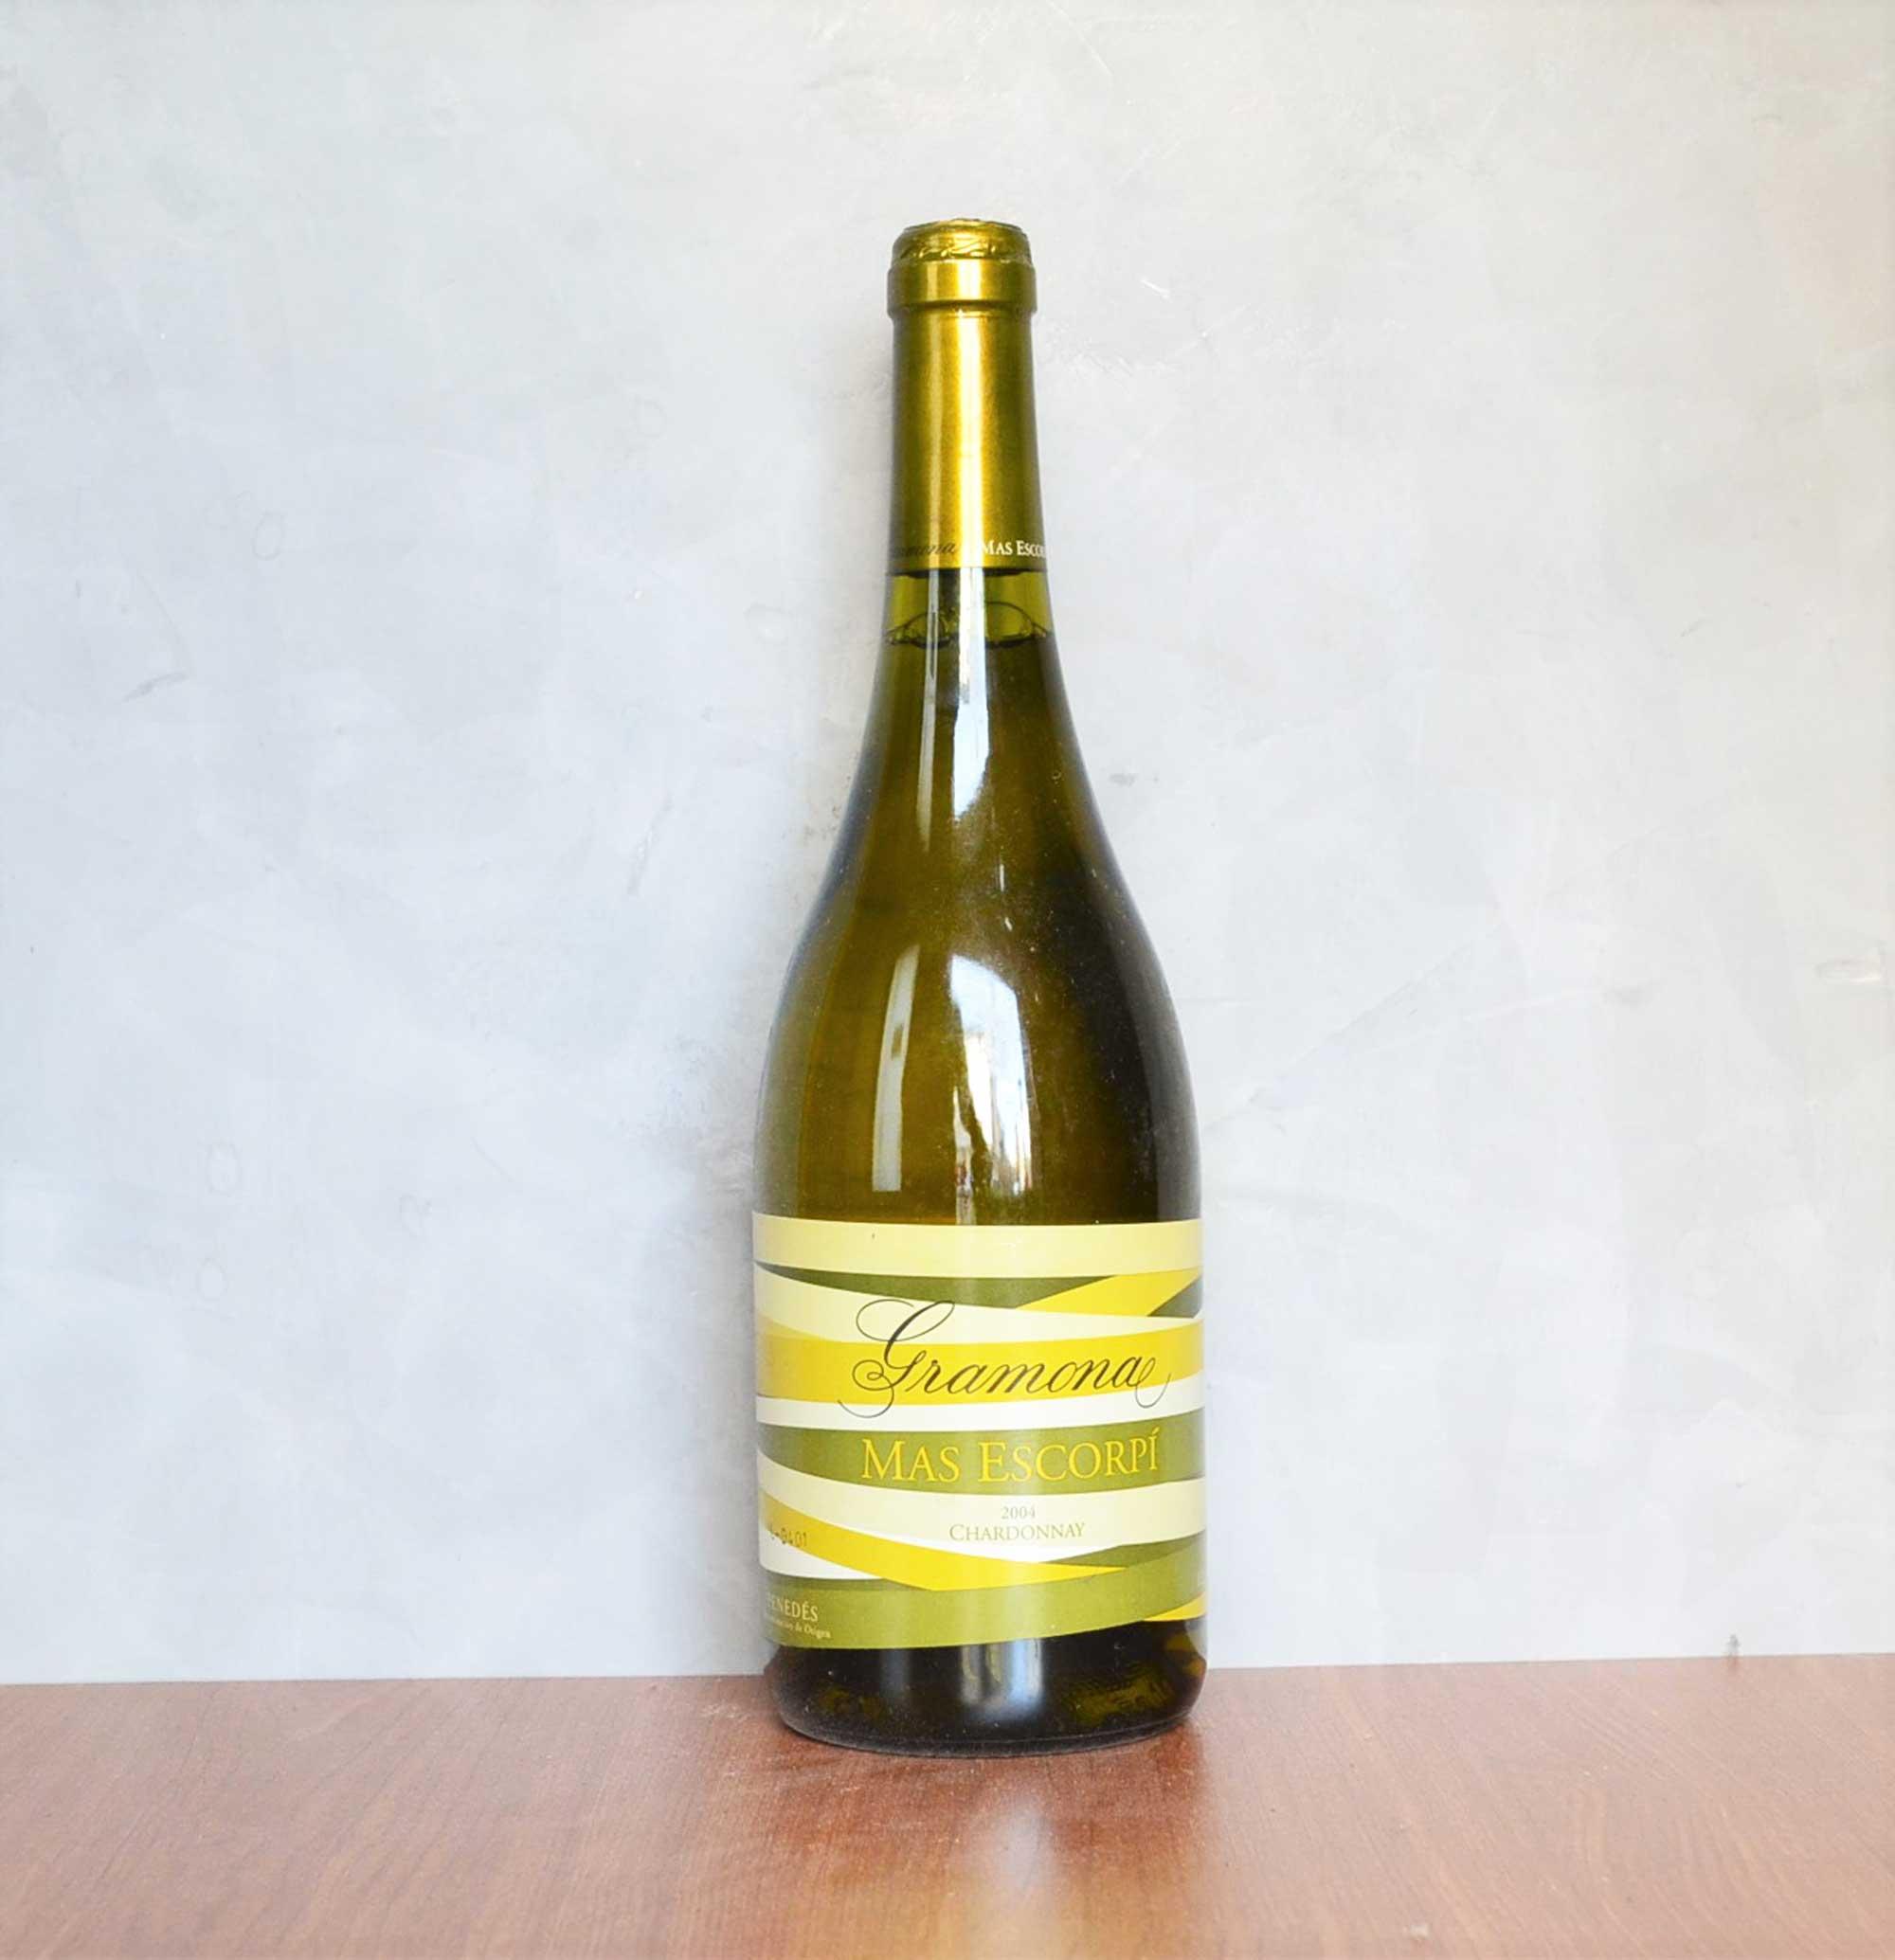 Gramona Mas Escorpí Chardonnay 2004